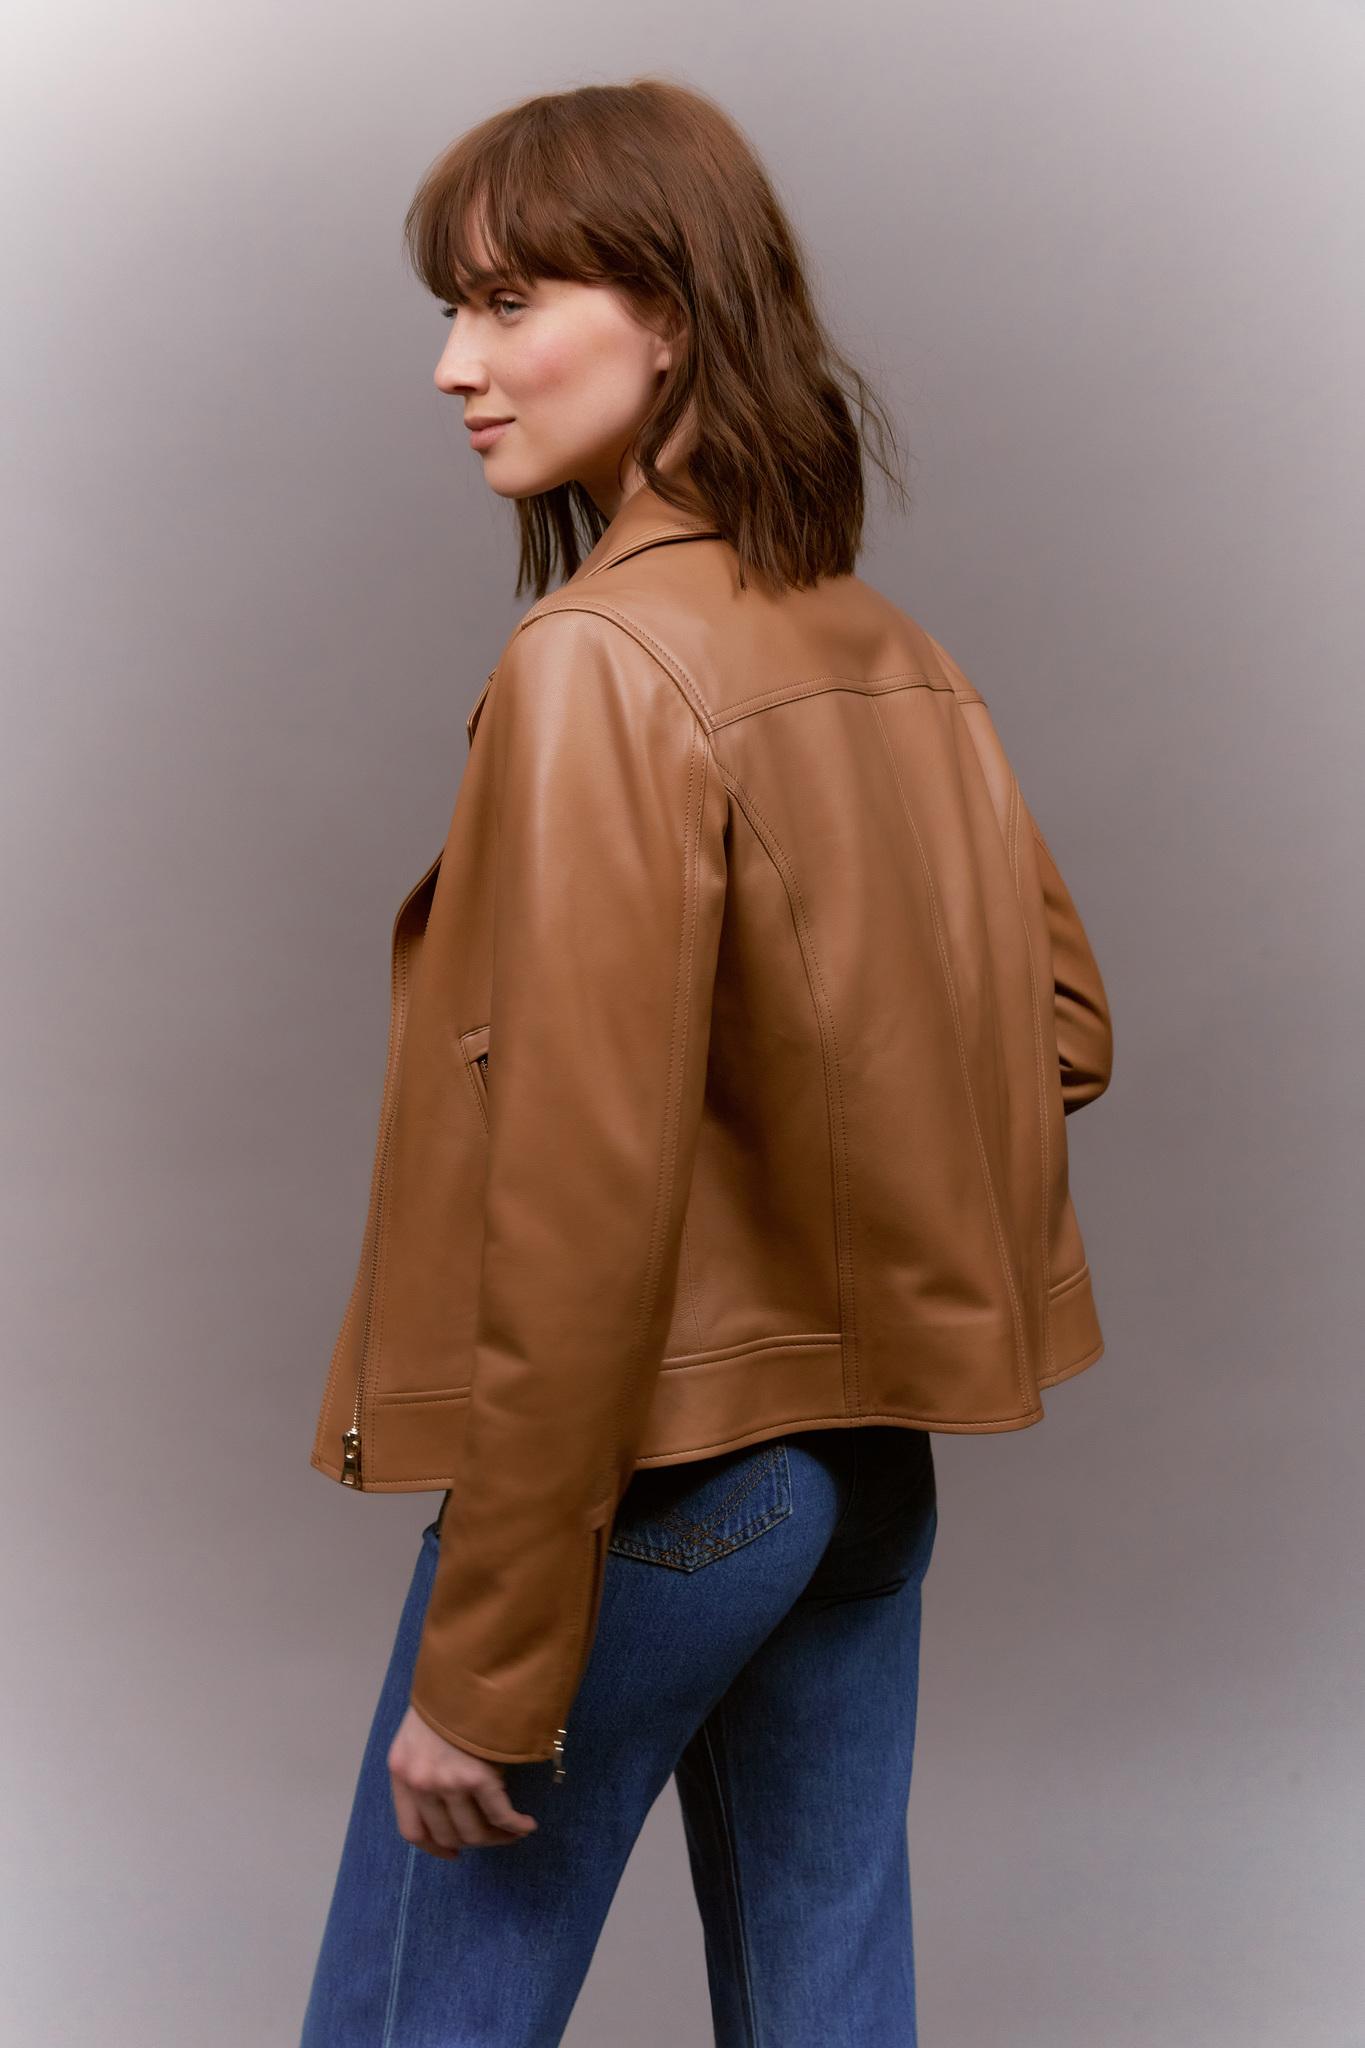 MARGOT - Кожаная байкерская куртка